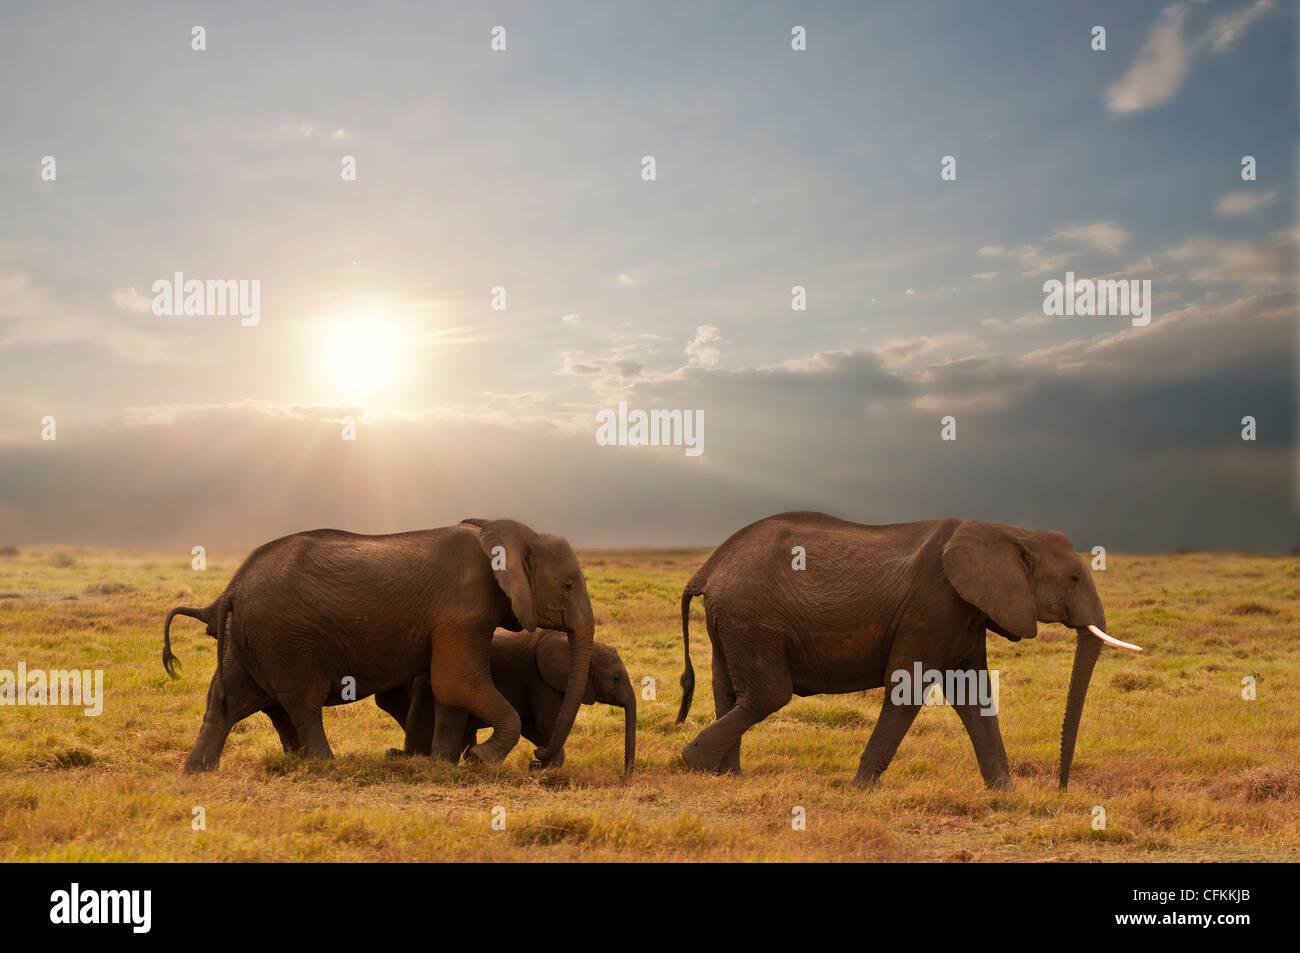 Elefantenfamilie im Amboseli Nationalpark, Kenia Stockfoto